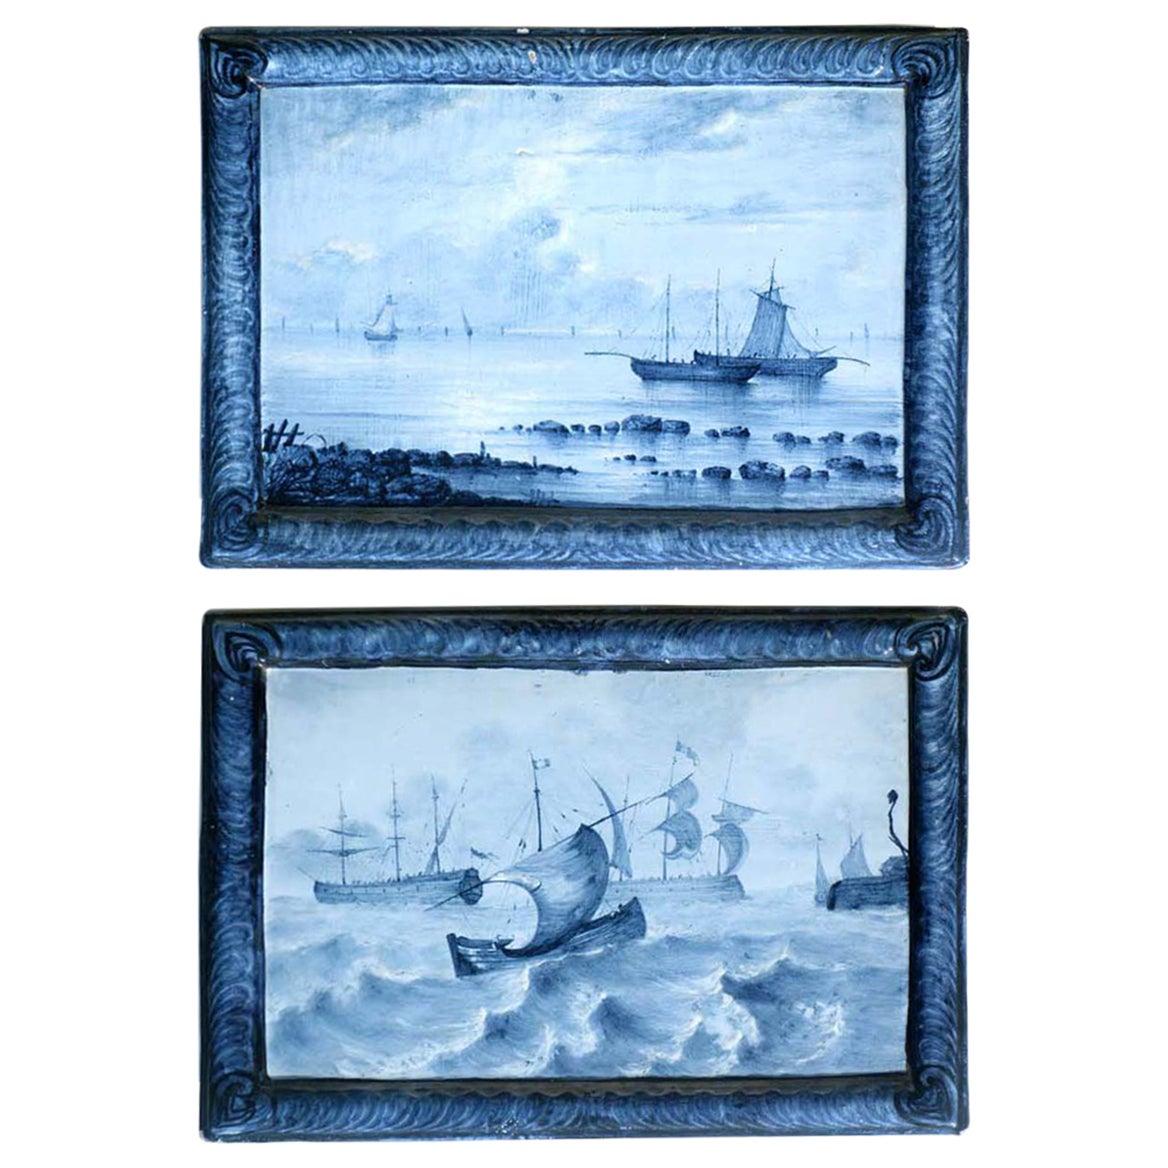 Emile Gallé Blue Faience 1880-1890 Marine Landscape Ceramic Tiles, Set of 2